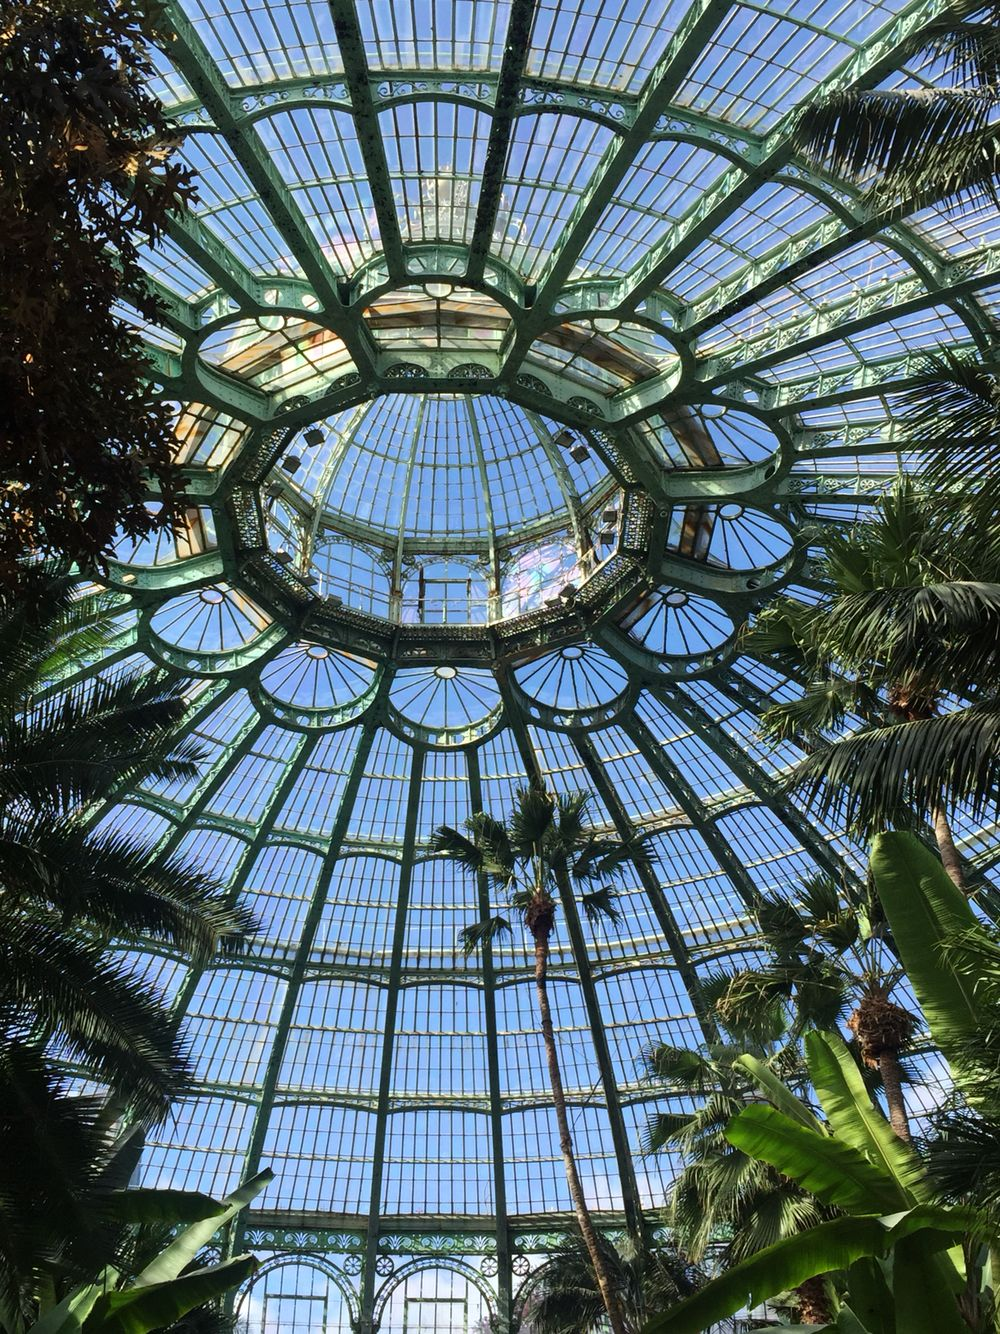 Elegant Brussels Belgium Royal Gardens Nerlands Royal Dutch Gardens Coupon Laeken North Brussels Royal Palace Laeken North Royal Palace